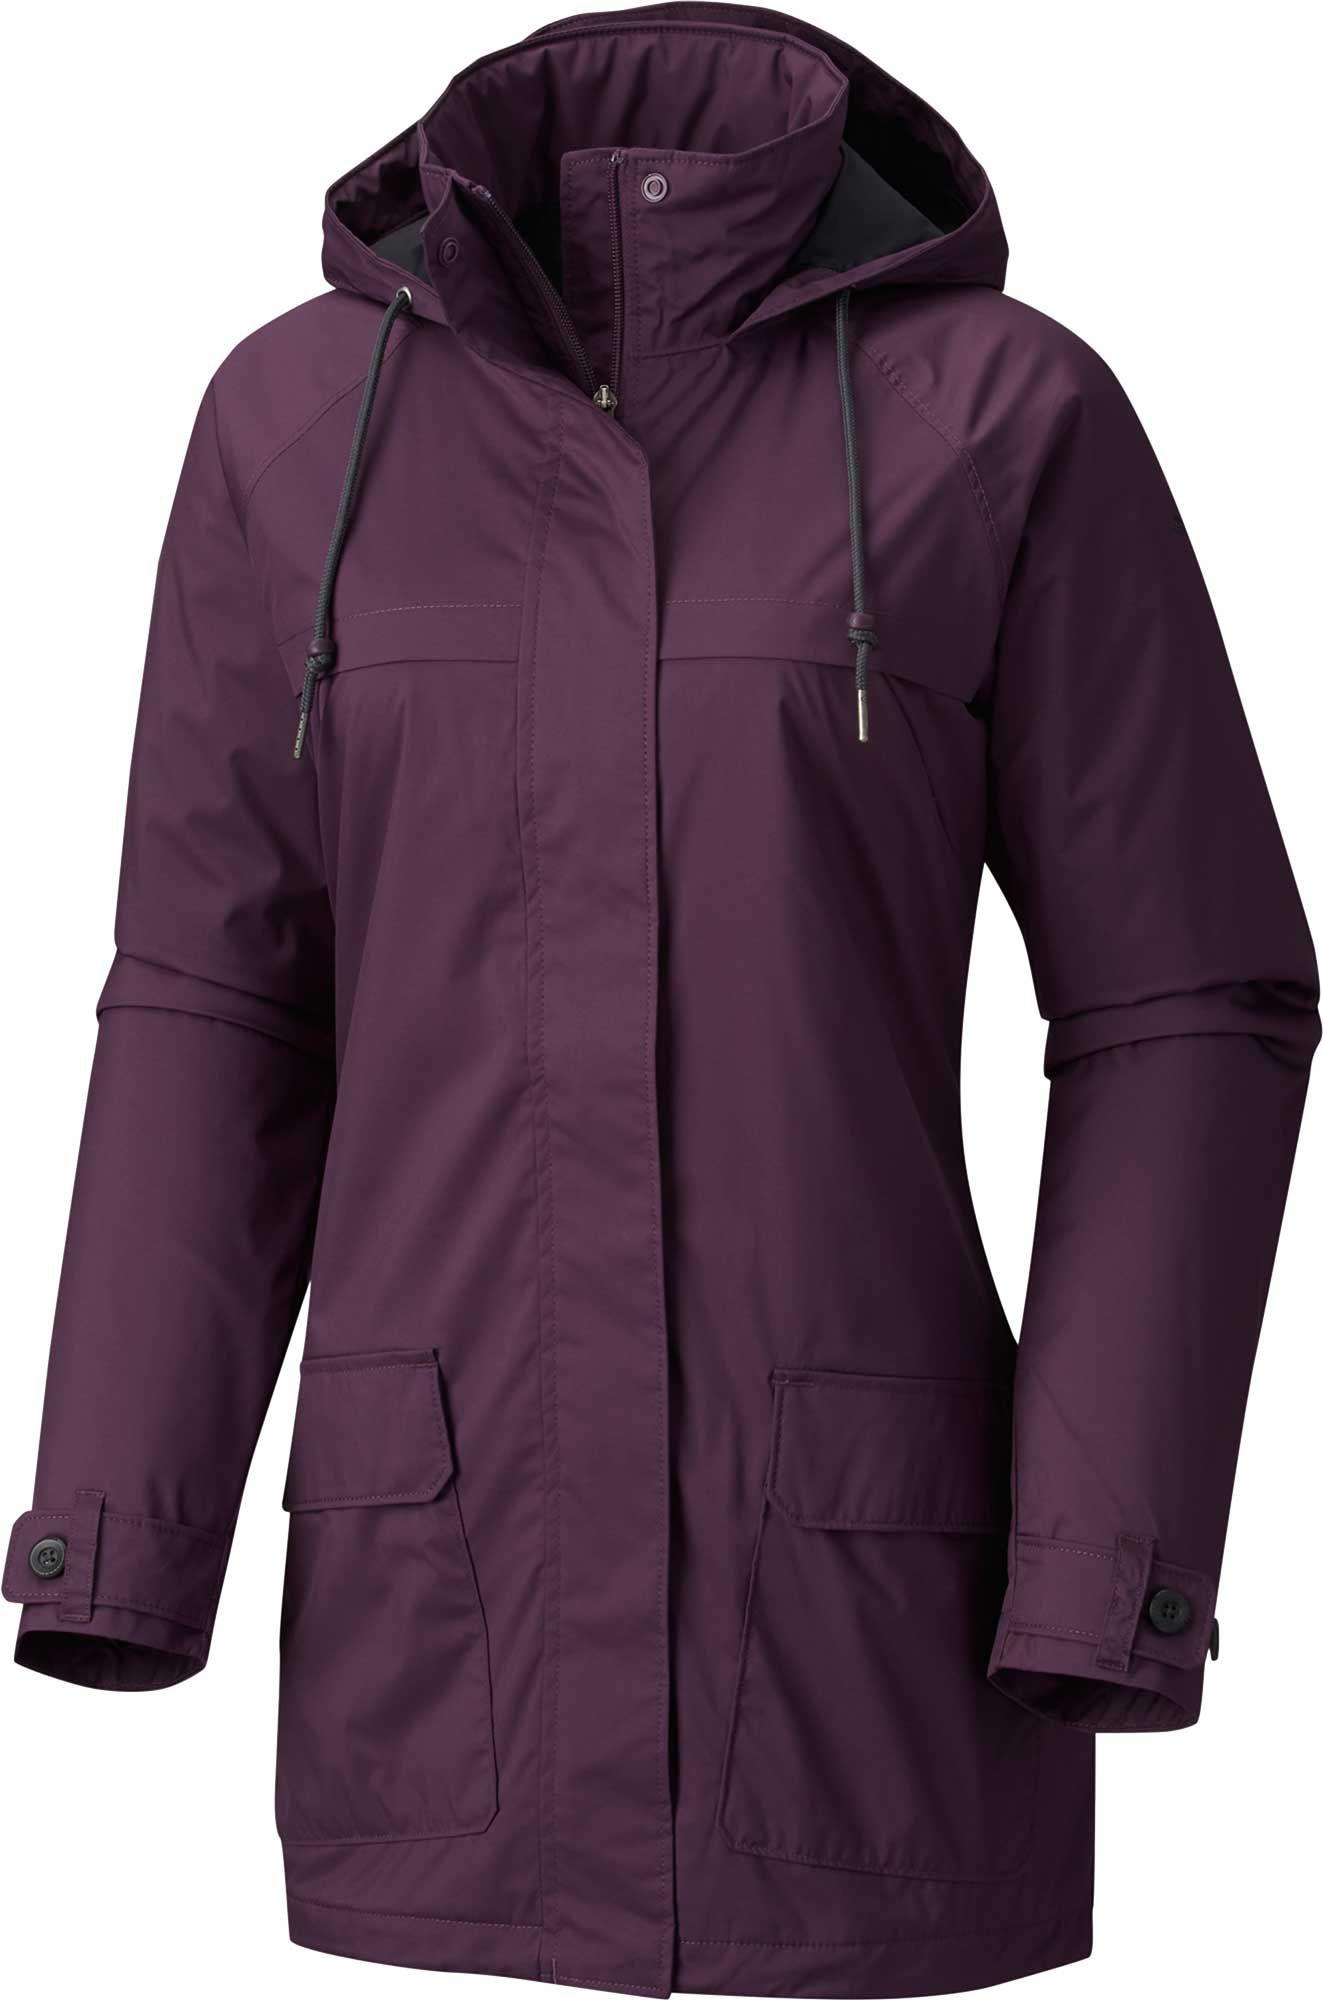 Women's petite insulated jackets